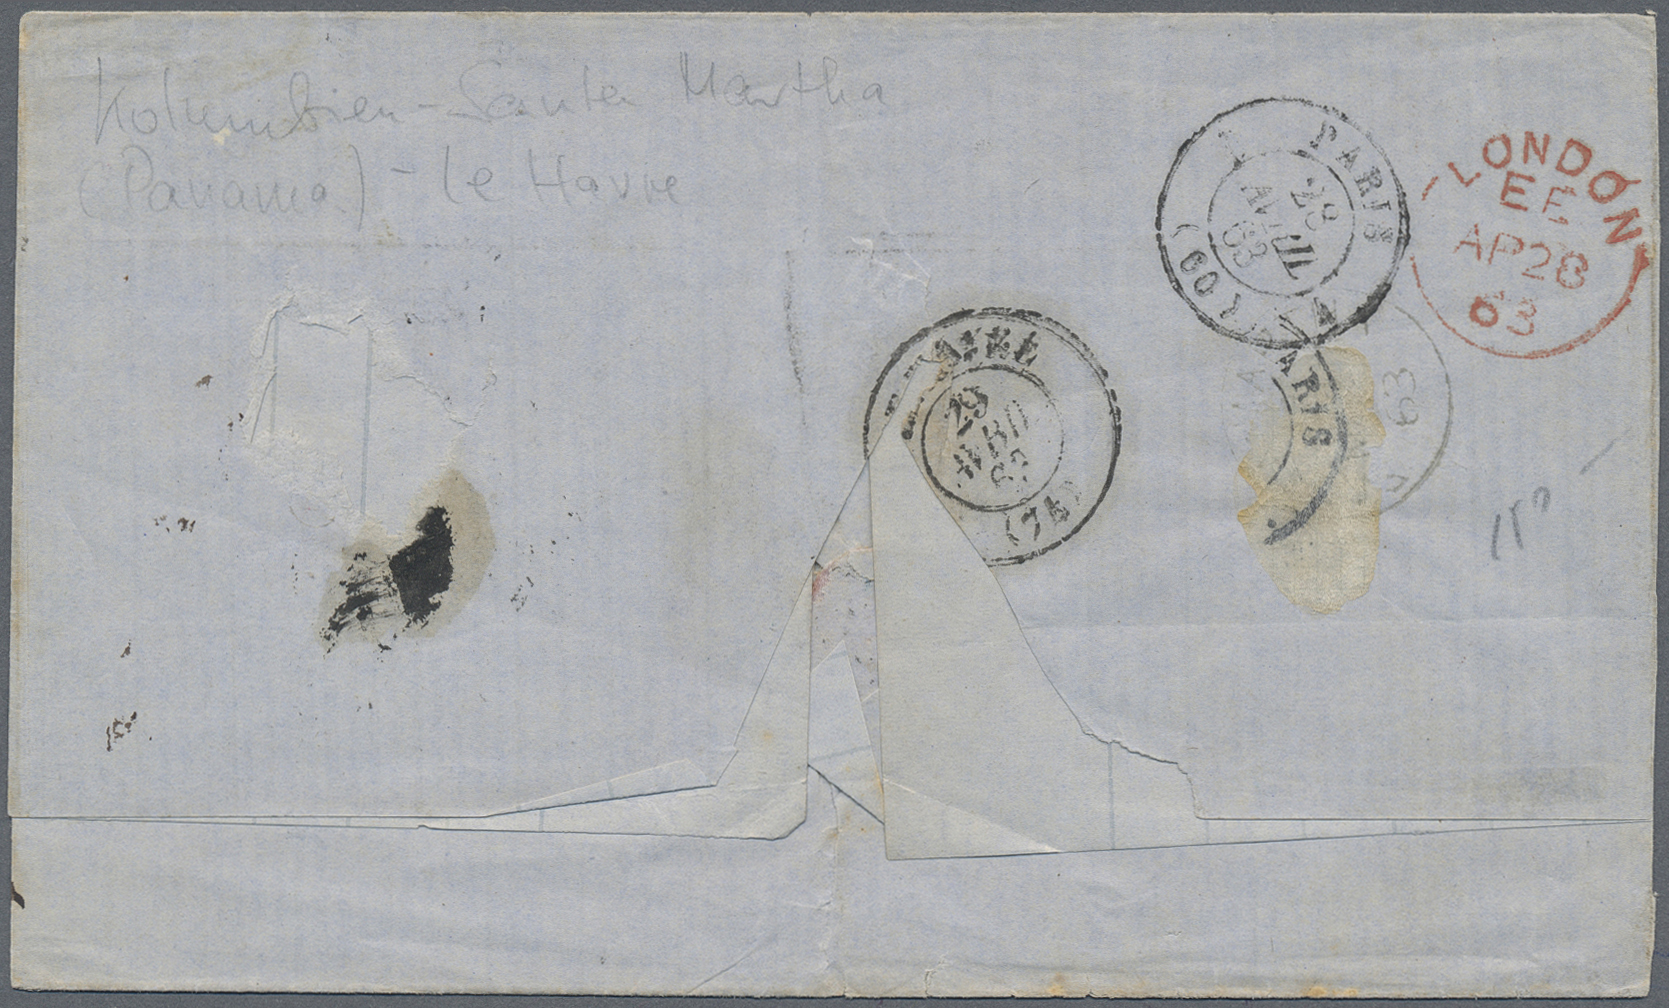 Lot 13928 - kolumbien  -  Auktionshaus Christoph Gärtner GmbH & Co. KG Single lots Philately Overseas & Europe. Auction #39 Day 4